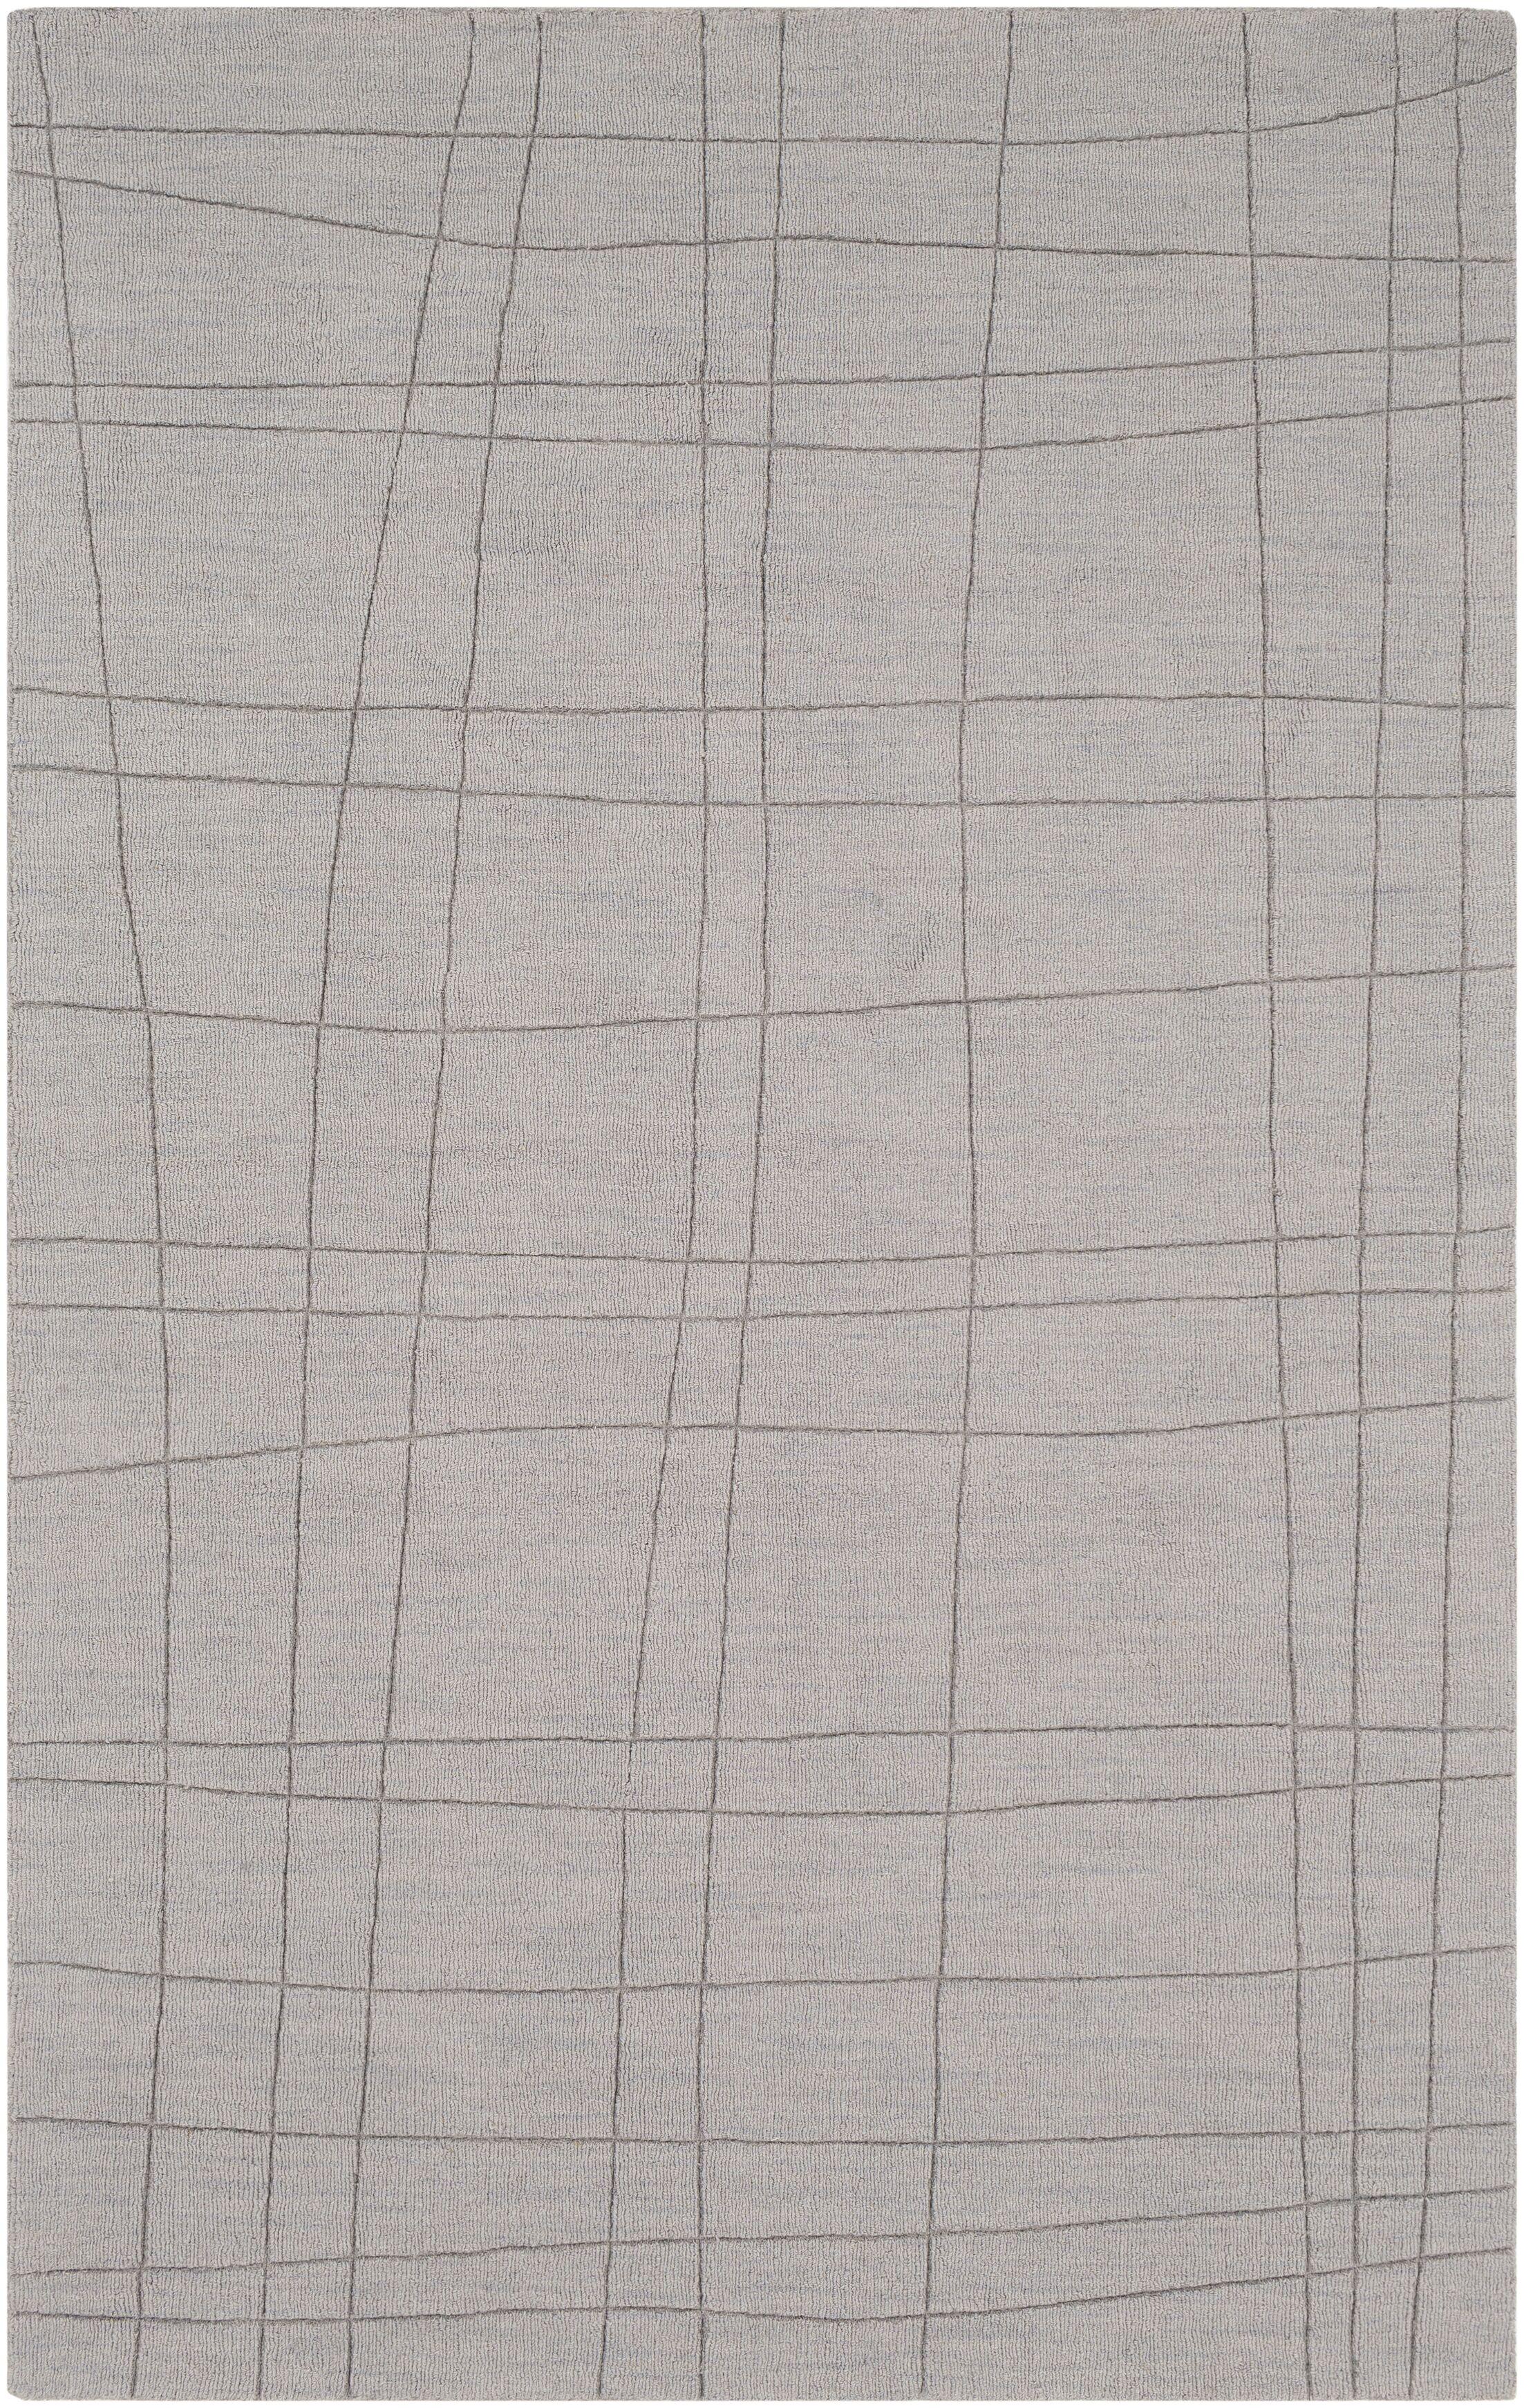 Ogilvie Hand-Woven Wool Gray Area Rug Rug Size: Rectangle 8' x 11'